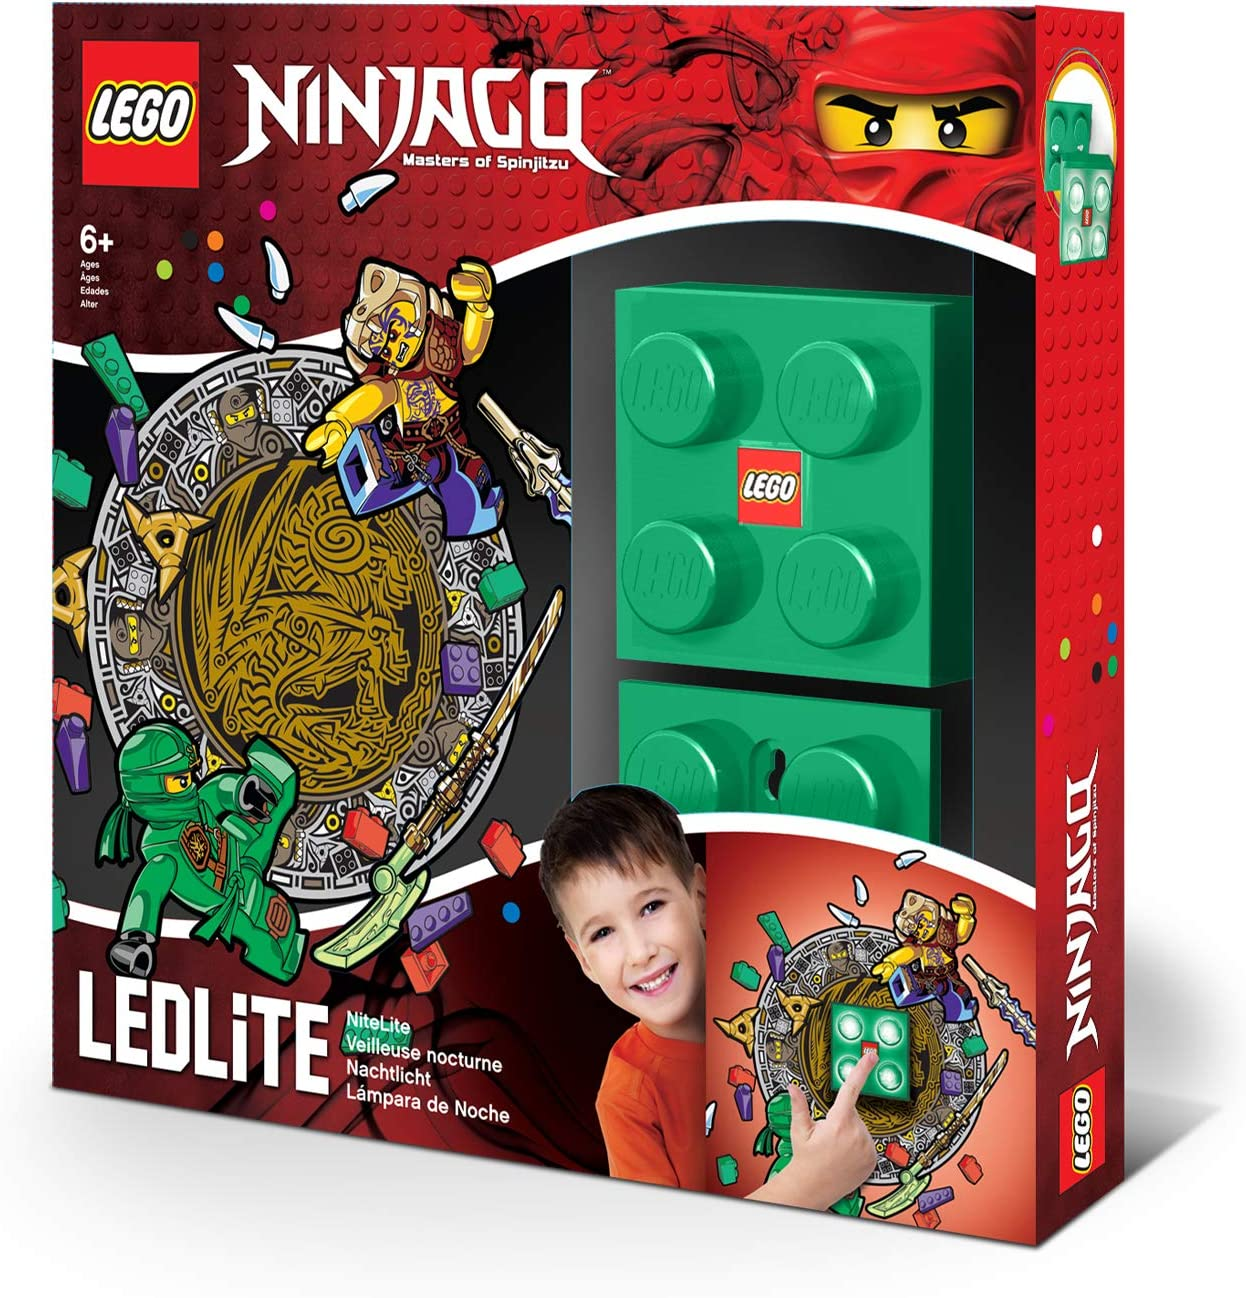 IQ Lego Ninjago Green Night Light - LED NiteLite with Lloyd Wall Decals